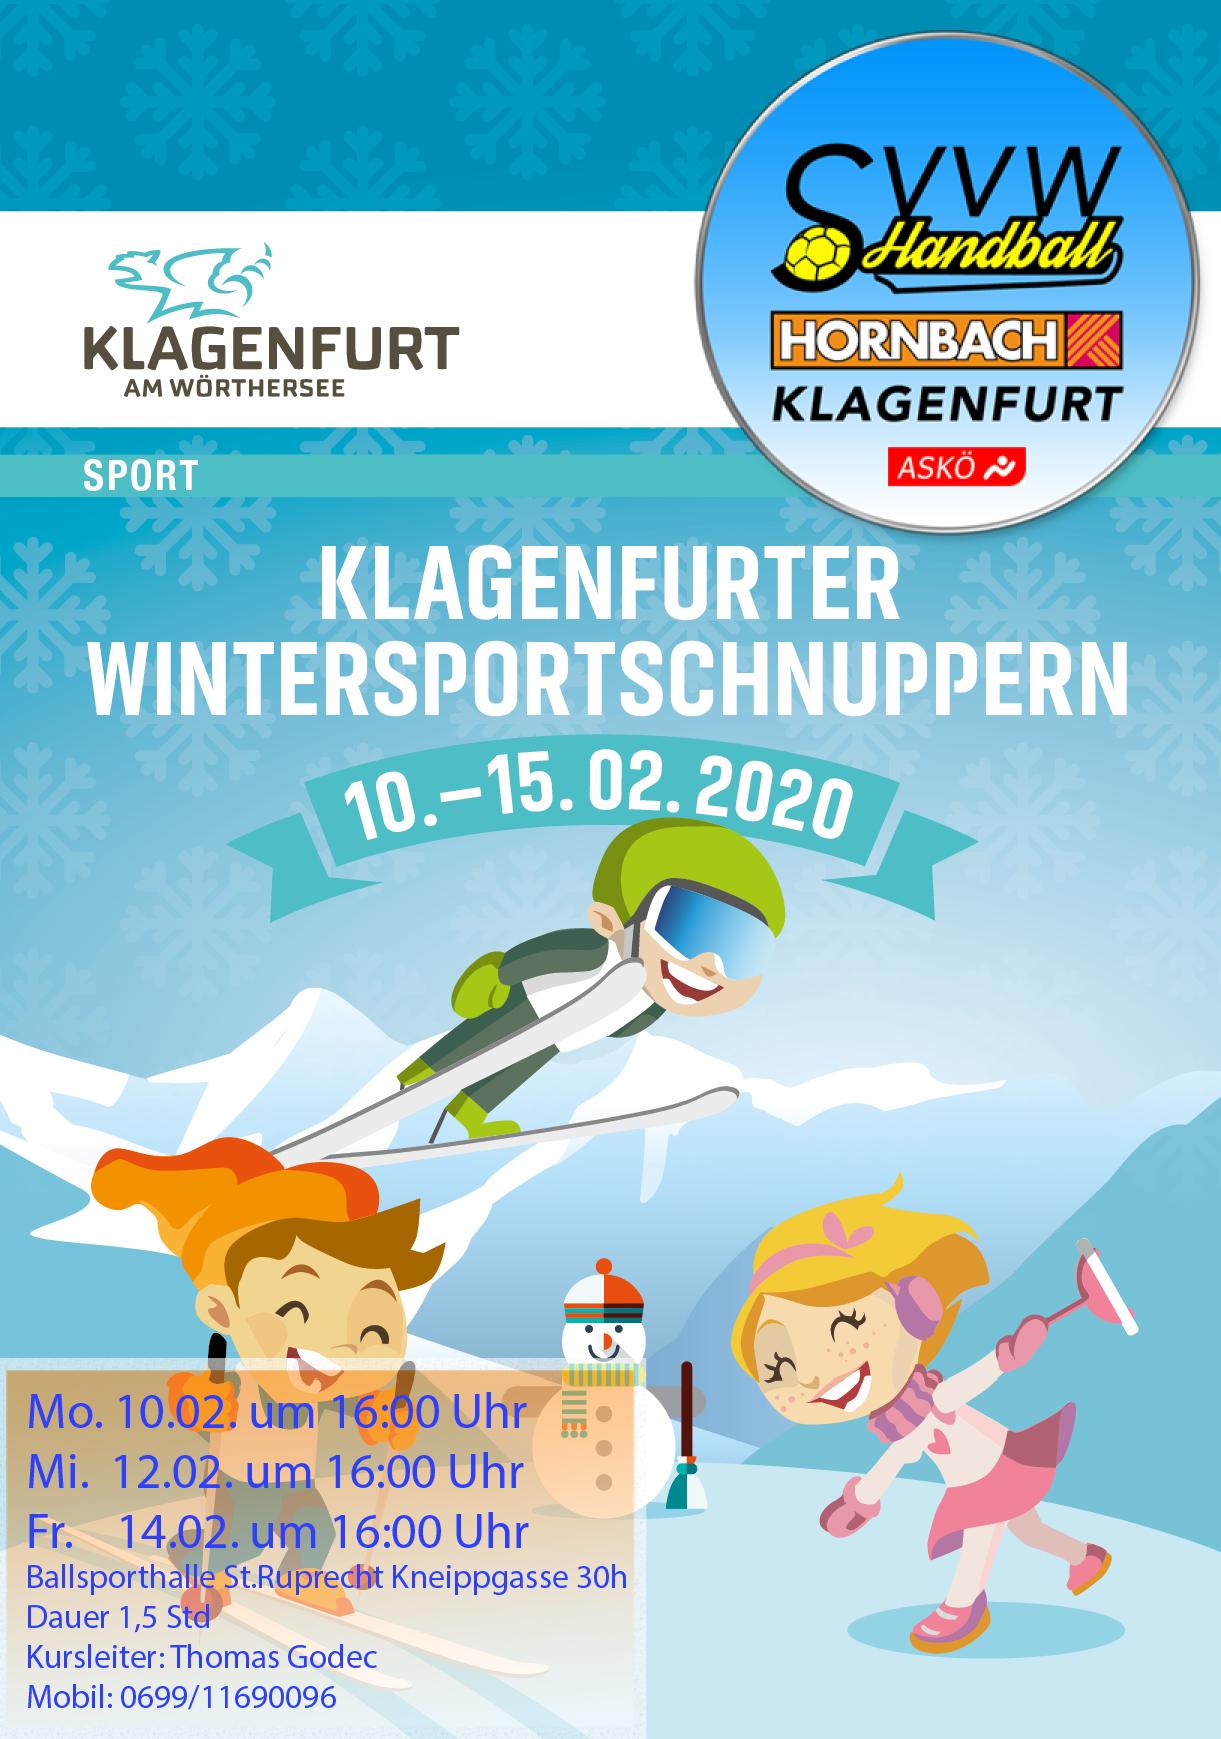 Hornbach Klagenfurt